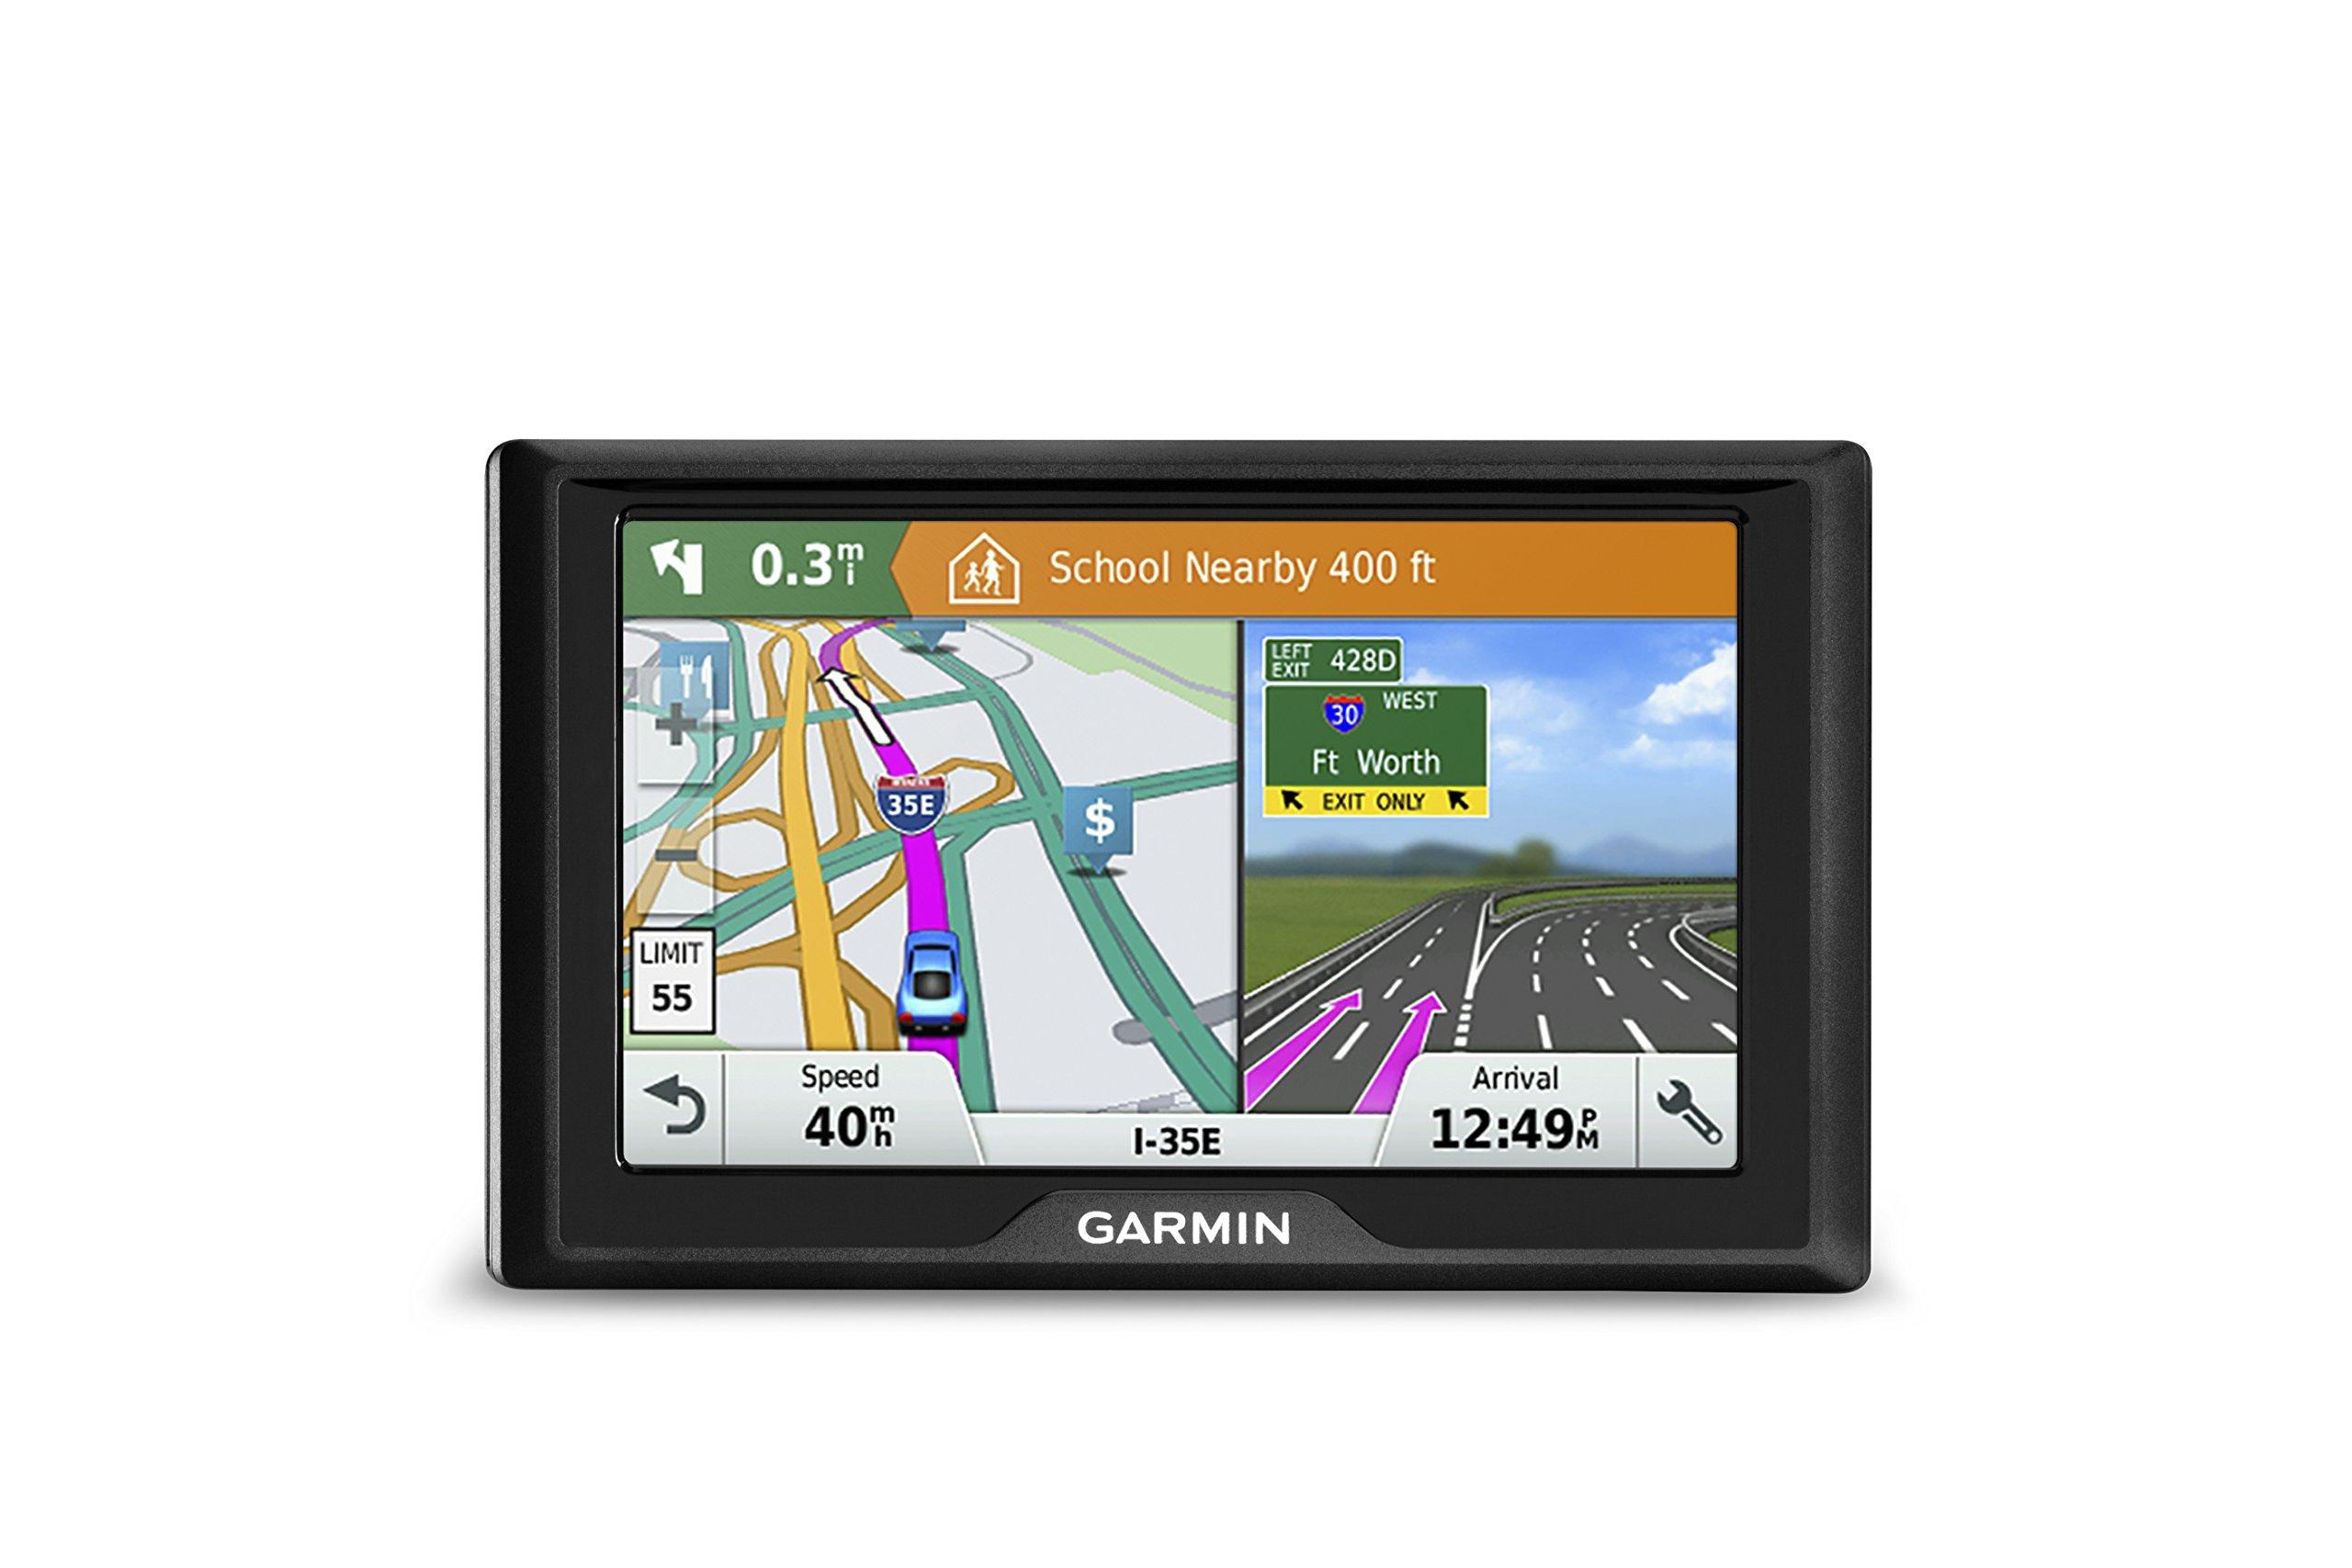 Garmin Navigator Directions TripAdvisor Foursquare